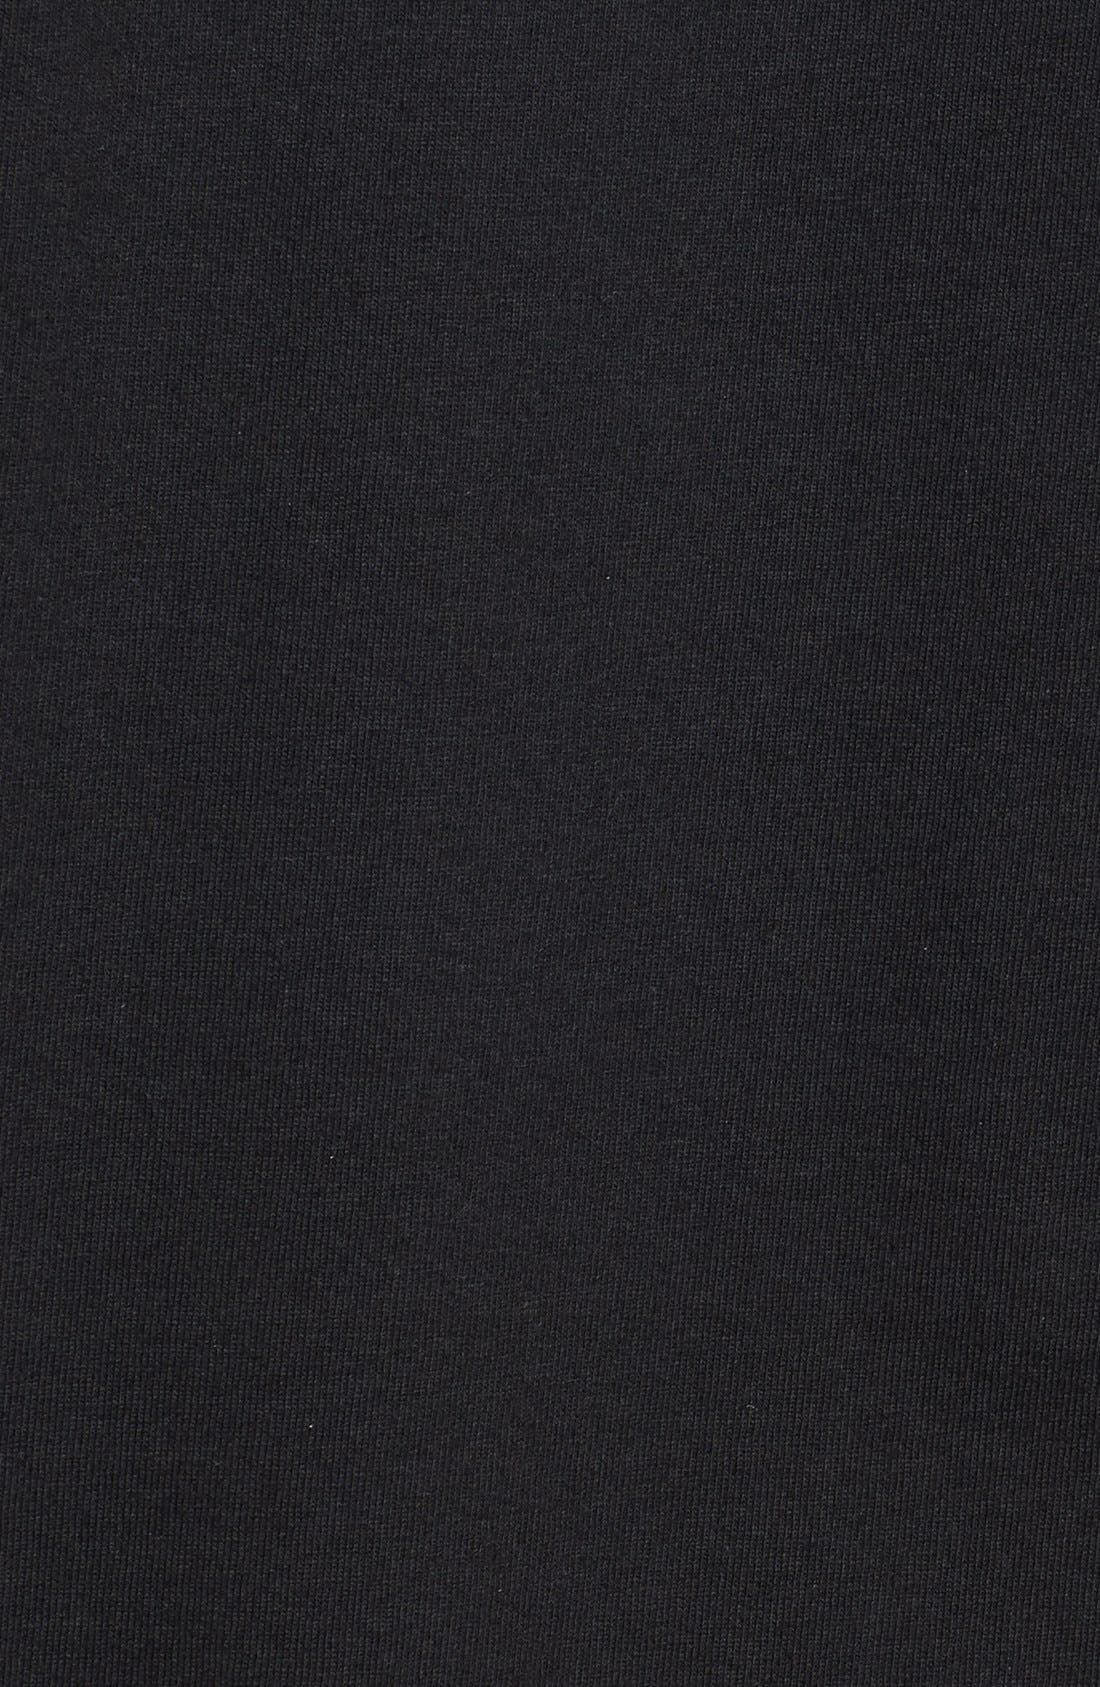 Alternate Image 3  - Jack O'Neill 'Marriage' Crewneck T-Shirt